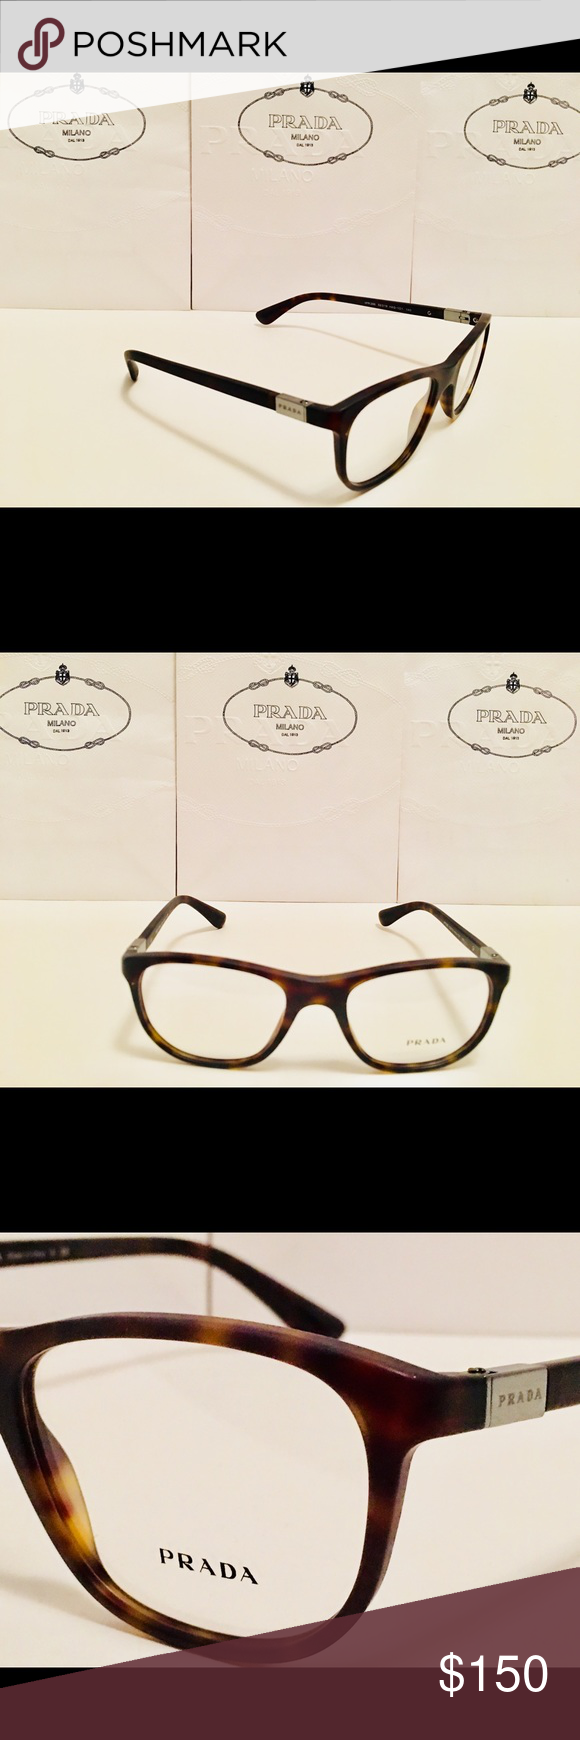 dc7098641afe Prada Eyeglasses VPR29S Matte Havana Brown 52mm Brand New! 100% Authentic! Prada  Eyeglasses VPR29S Matte Havana Brown 52mm Size  52-19-140 Unisex Demo Lens  ...